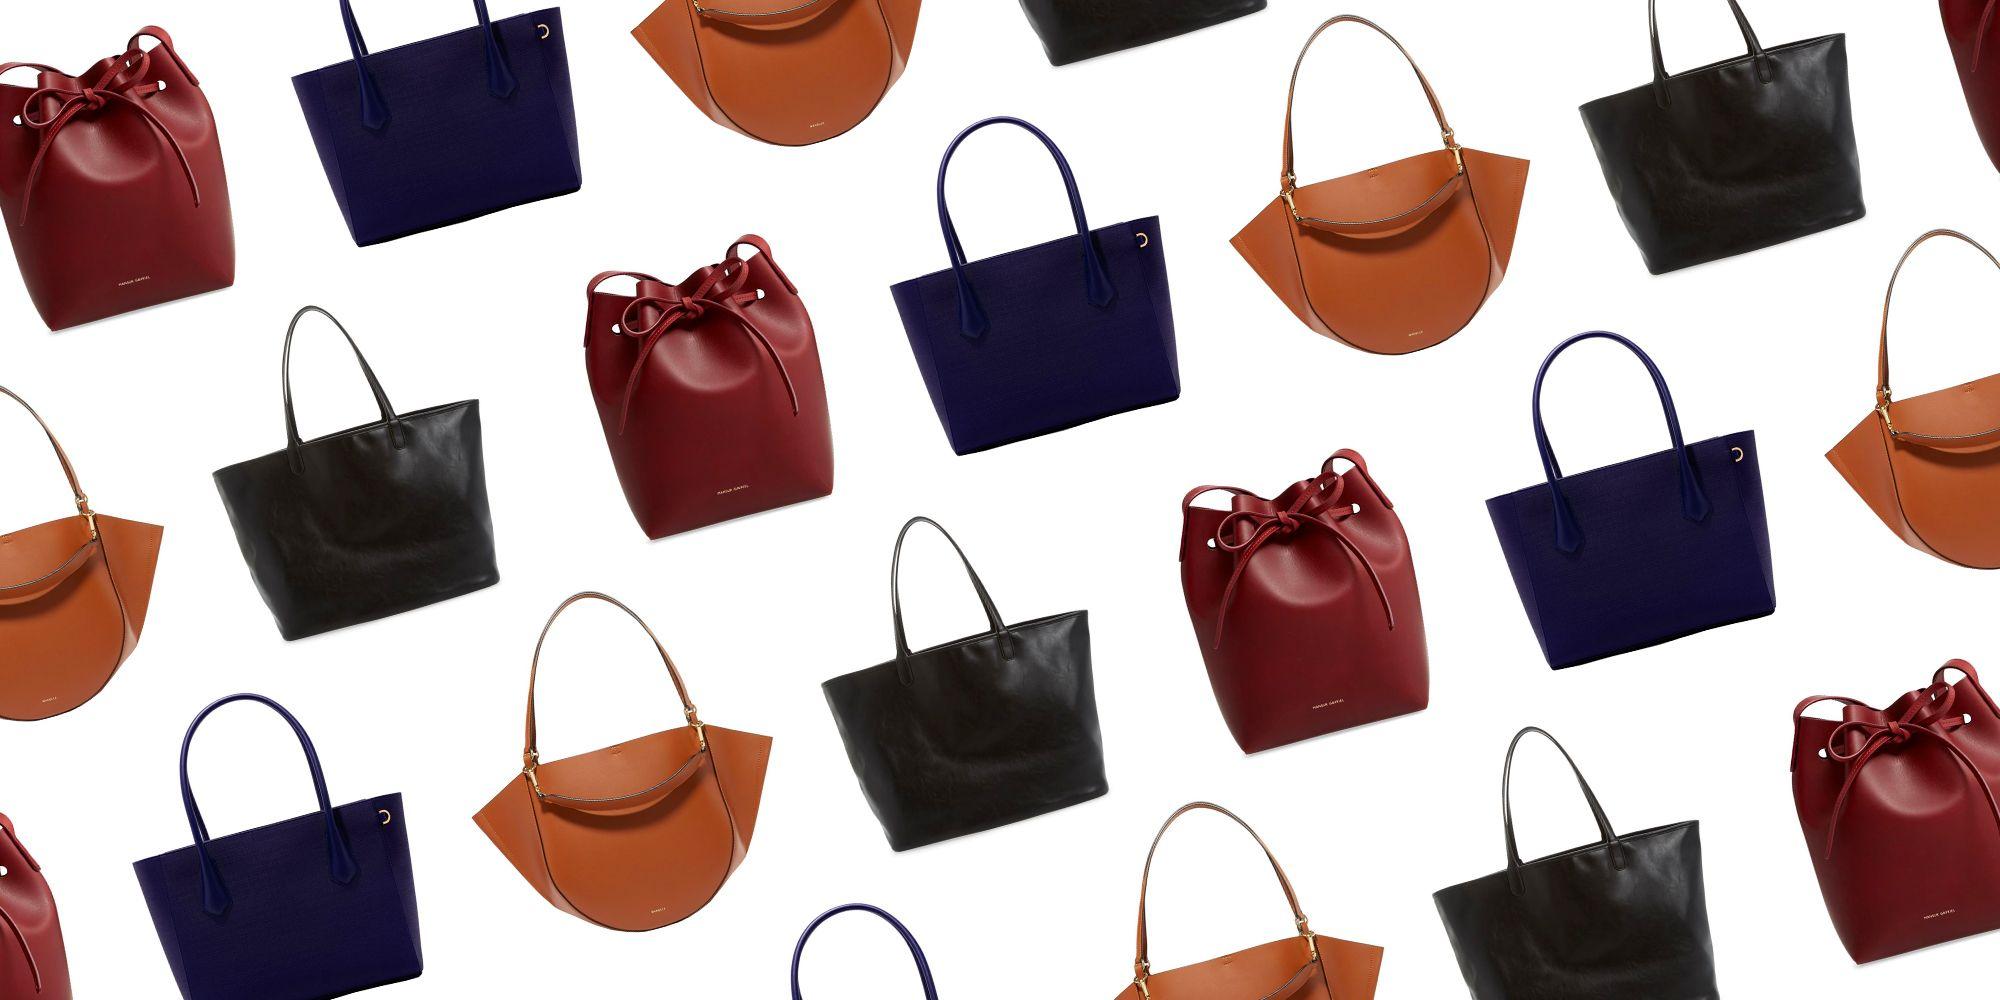 7d86917ed 9 Best Work Bags for Women 2019